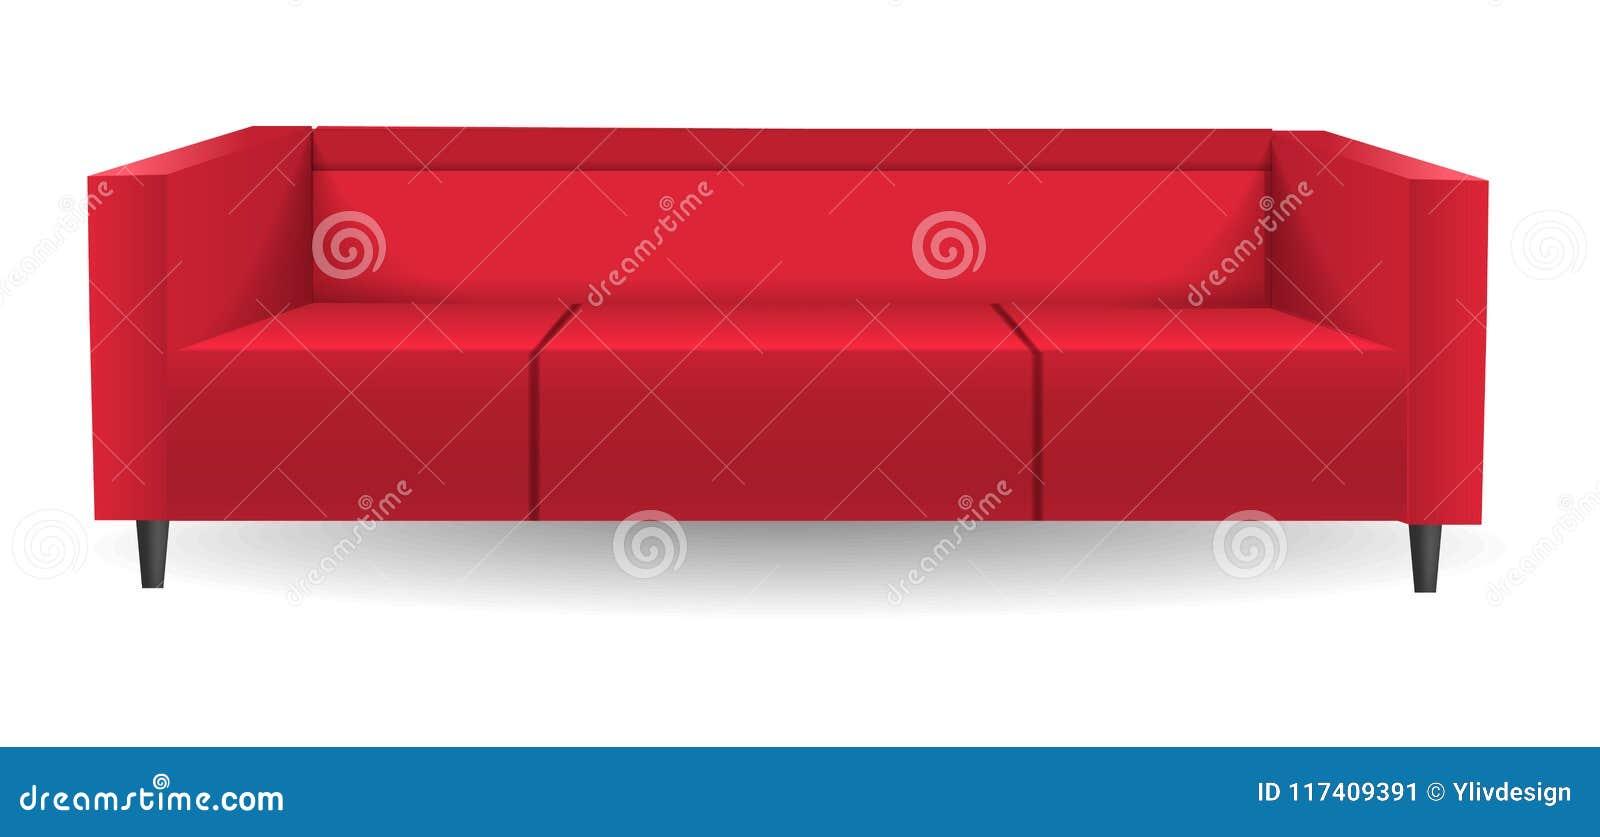 Red Corner Sofa Mockup, Realistic Style Stock Vector - Illustration ...